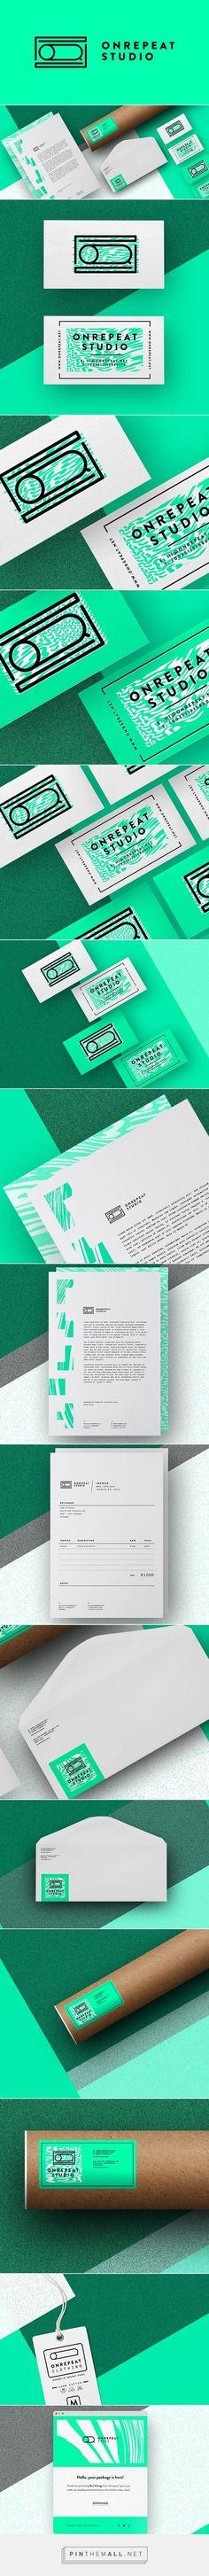 Onrepeat Creative Studio Self Branding | Fivestar Branding Agency – Design and Branding Agency & Curated Inspiration Gallery